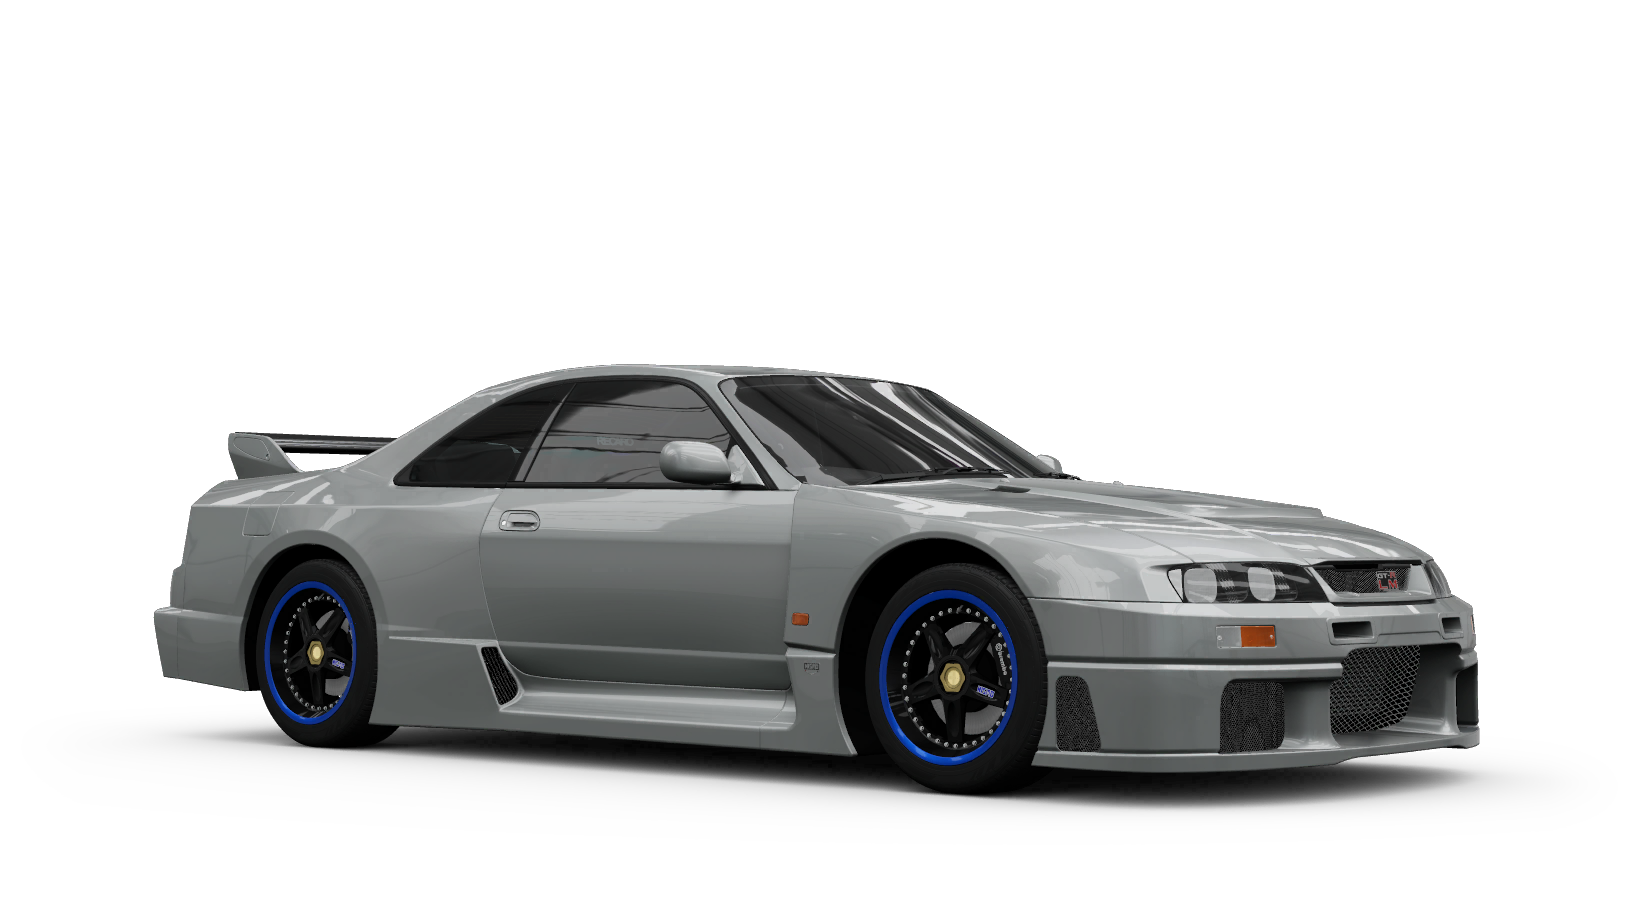 Nissan Nismo GT-R LM